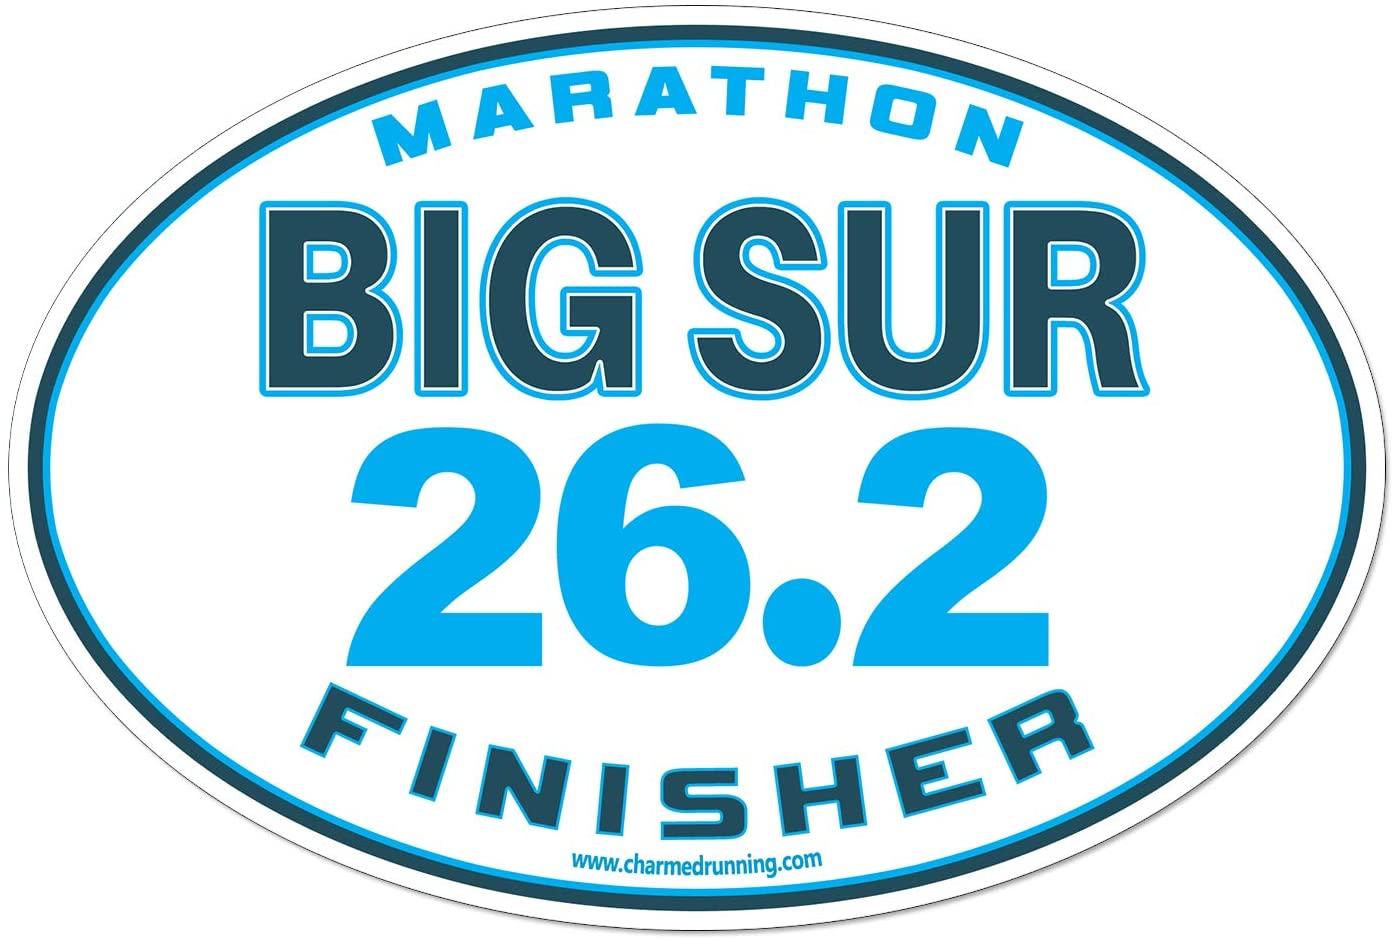 Charmed Running Big Sur Marathon Finisher 26.2 Car Magnet